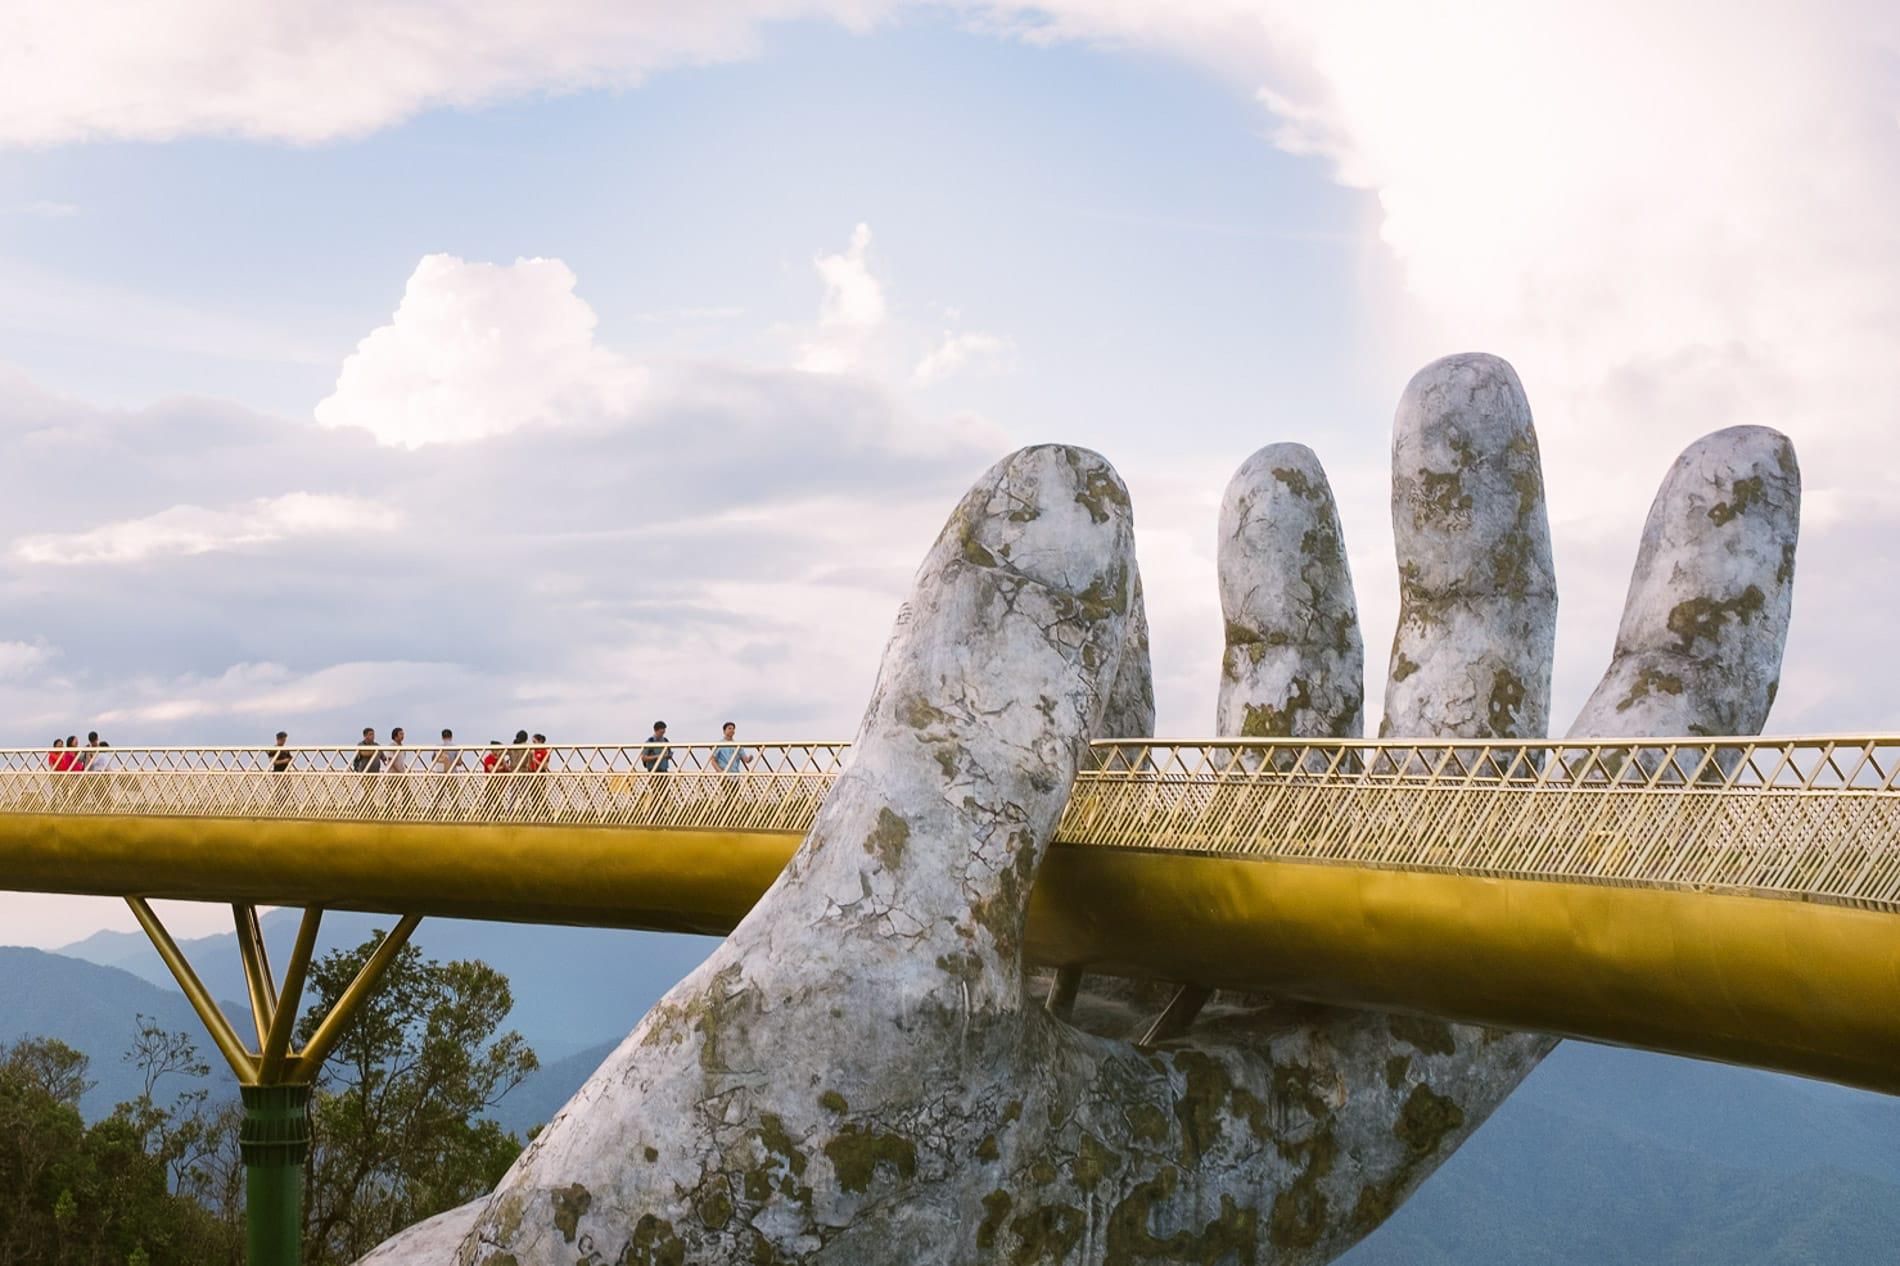 The Golden Hand Bridge in the bridges of Da Nang